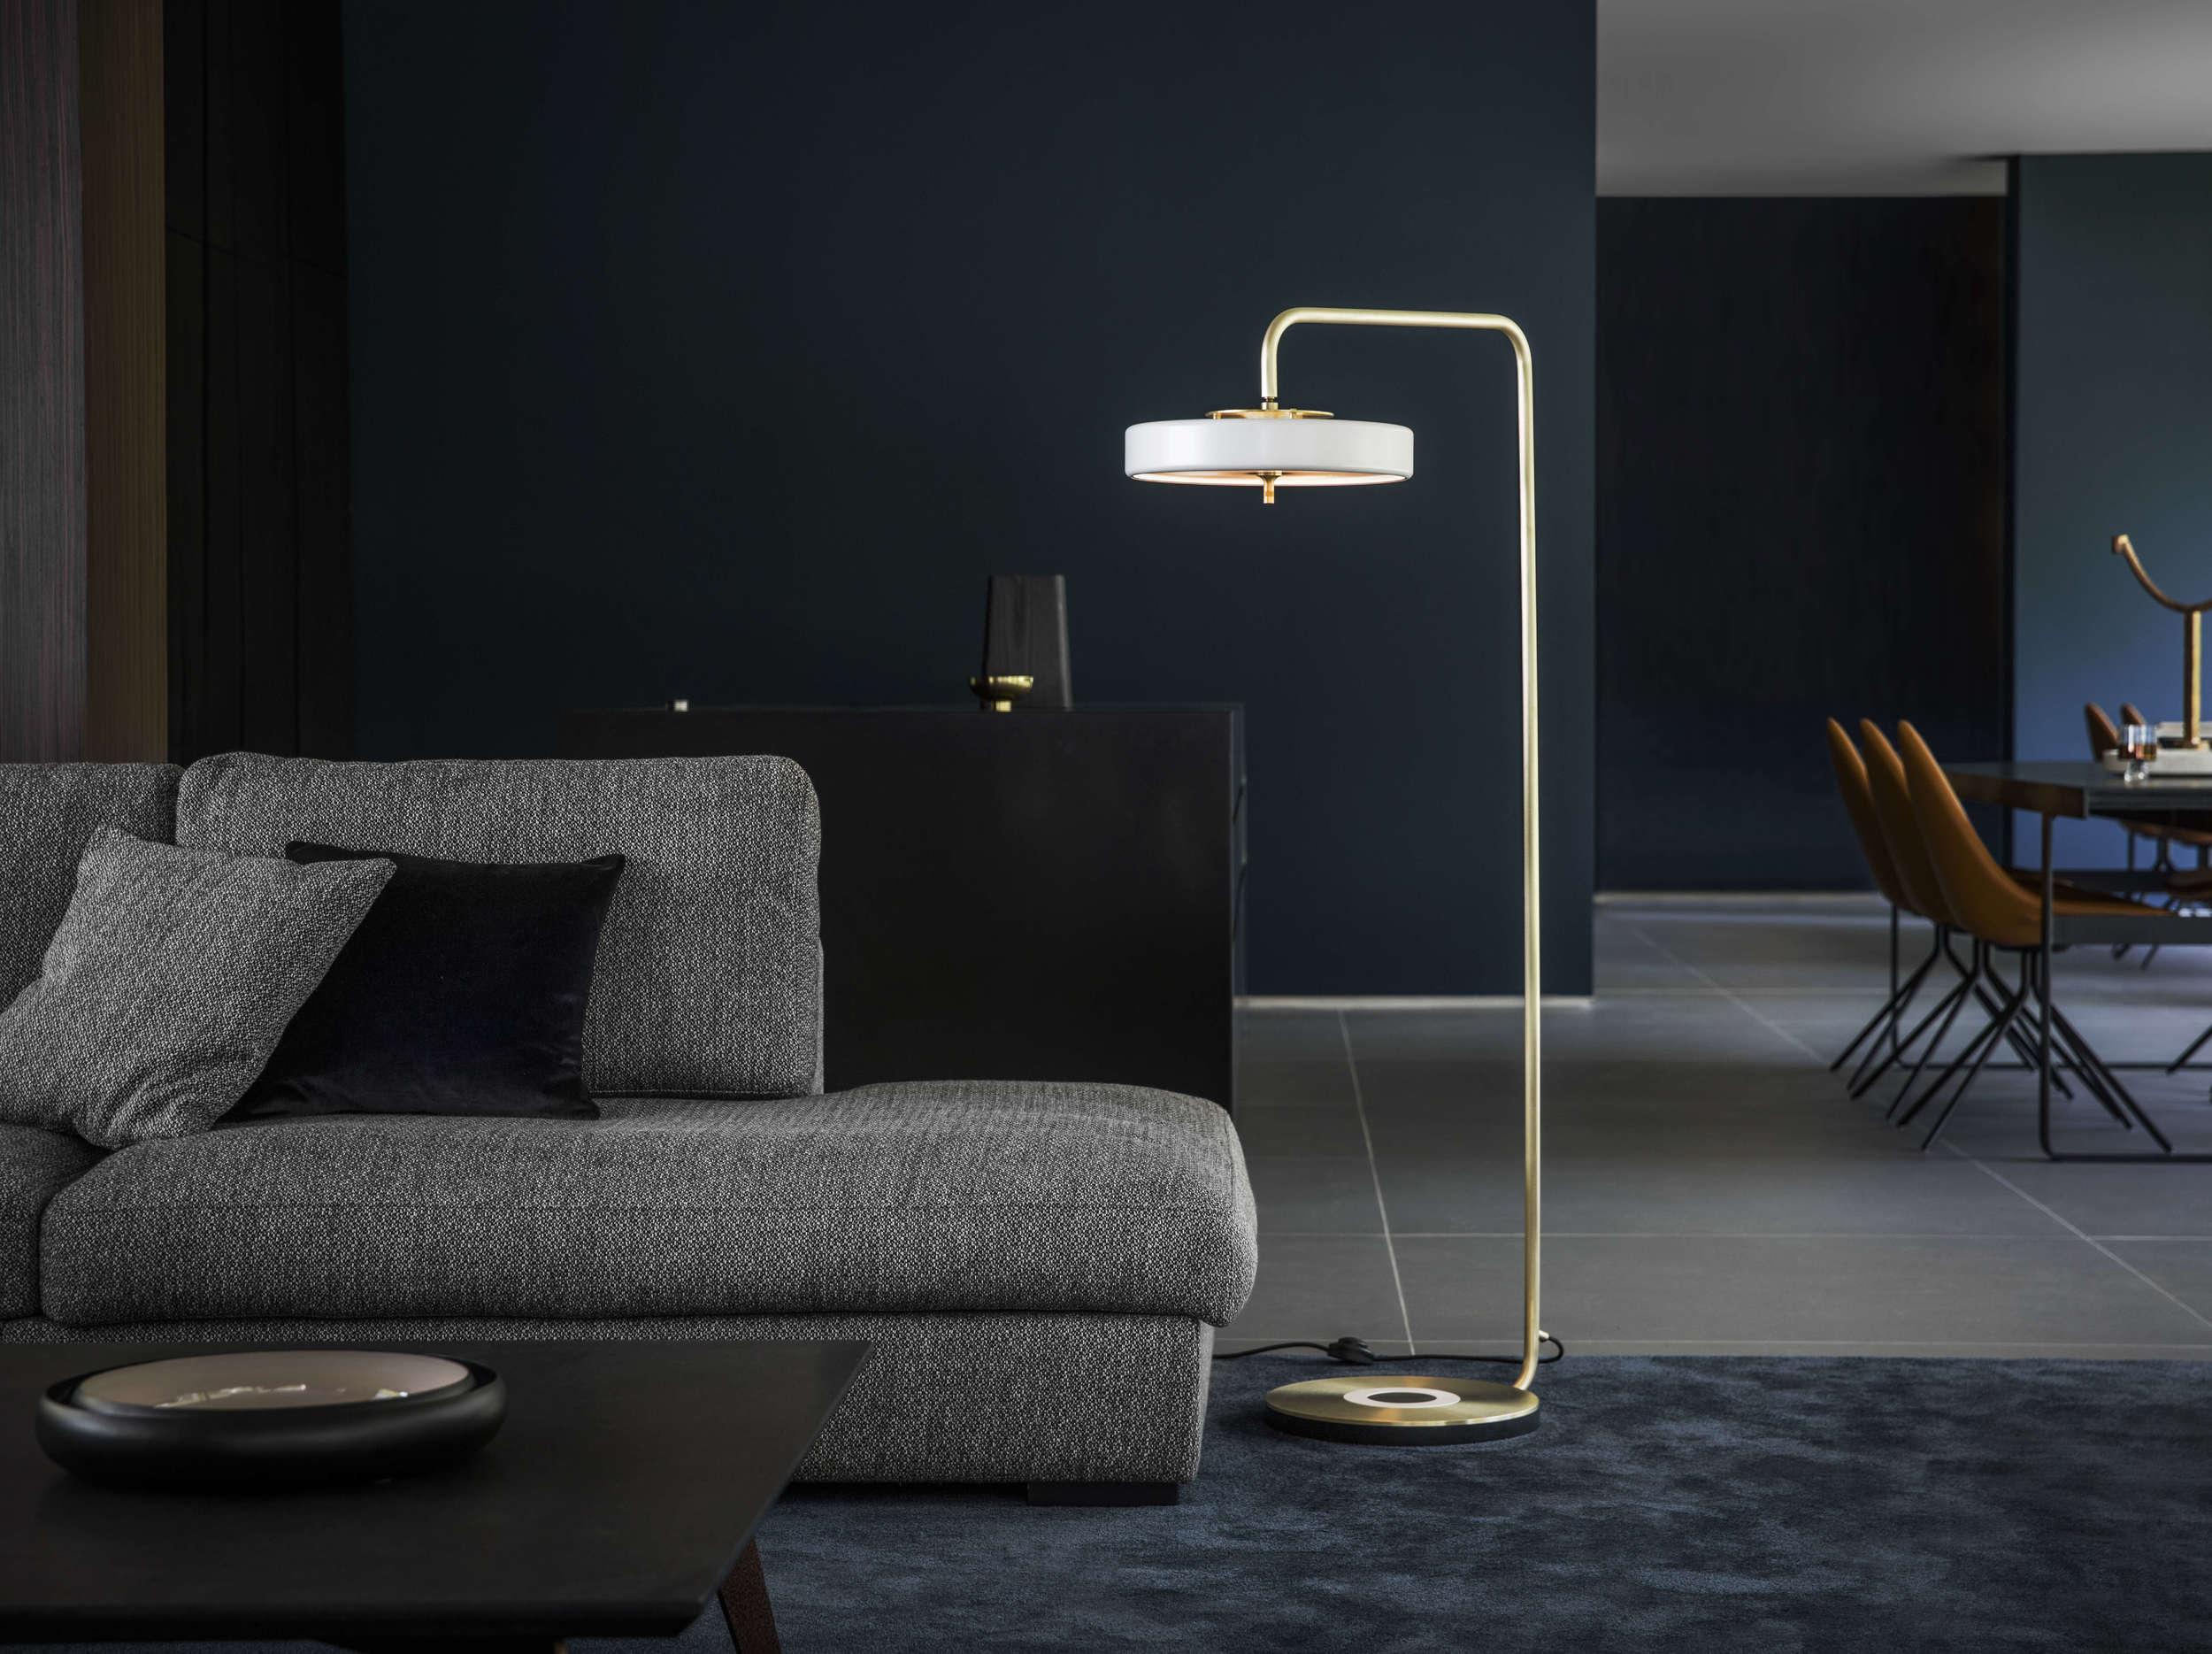 Lamp In Kast : Bert frank revolve stehlampe u hoyer kast interiors